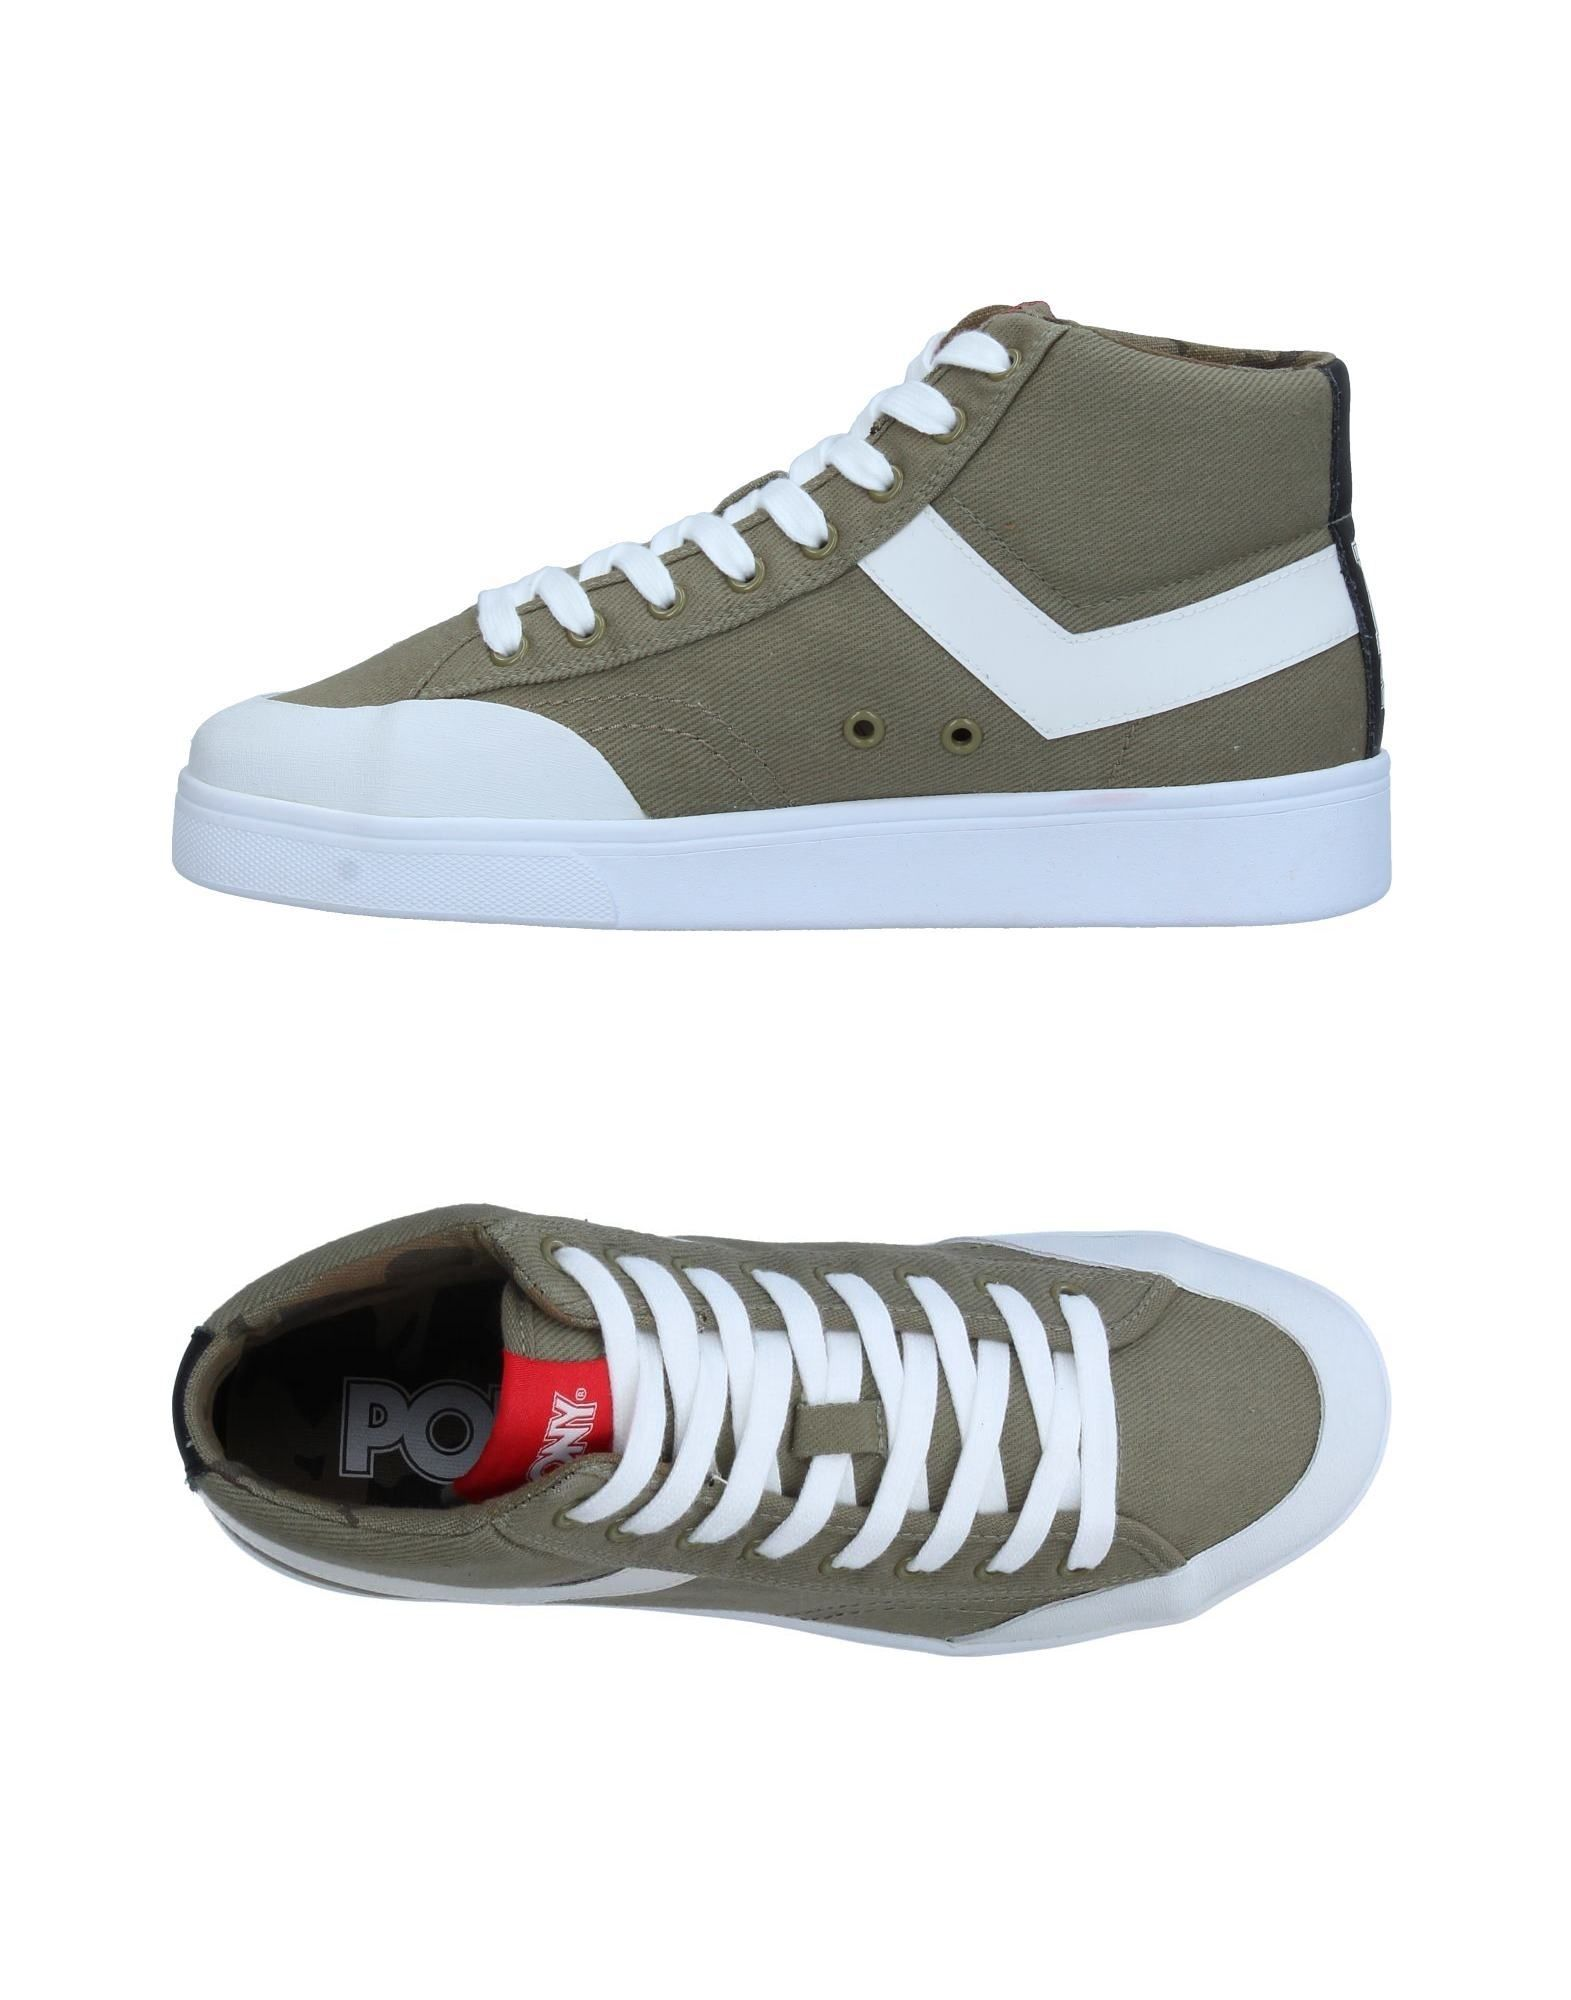 A buon mercato Sneakers Pony Uomo - 11340326WV